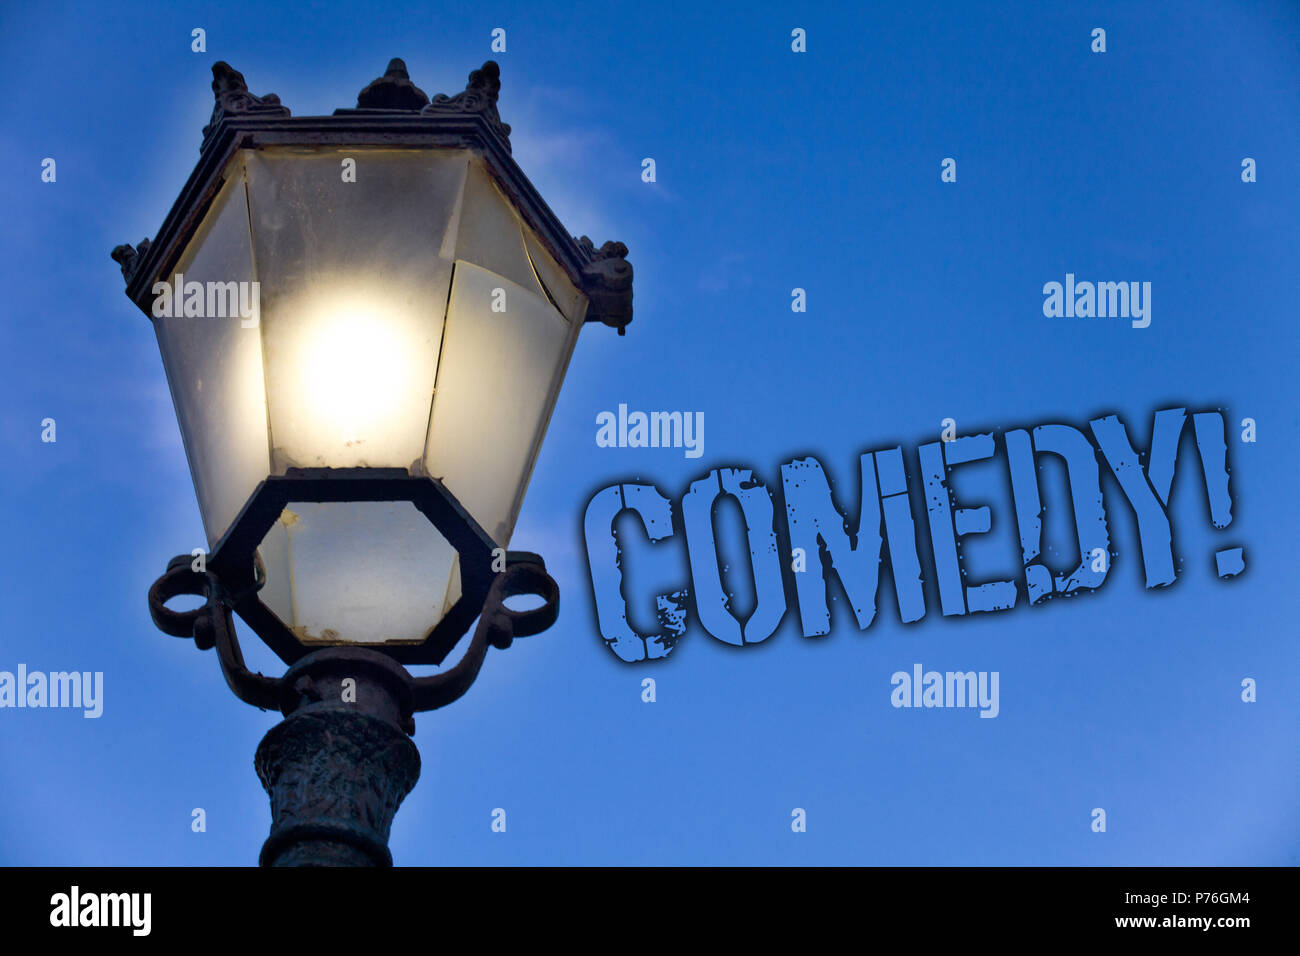 Text Sign Showing Comedy Call Conceptual Photo Fun Humor Satire